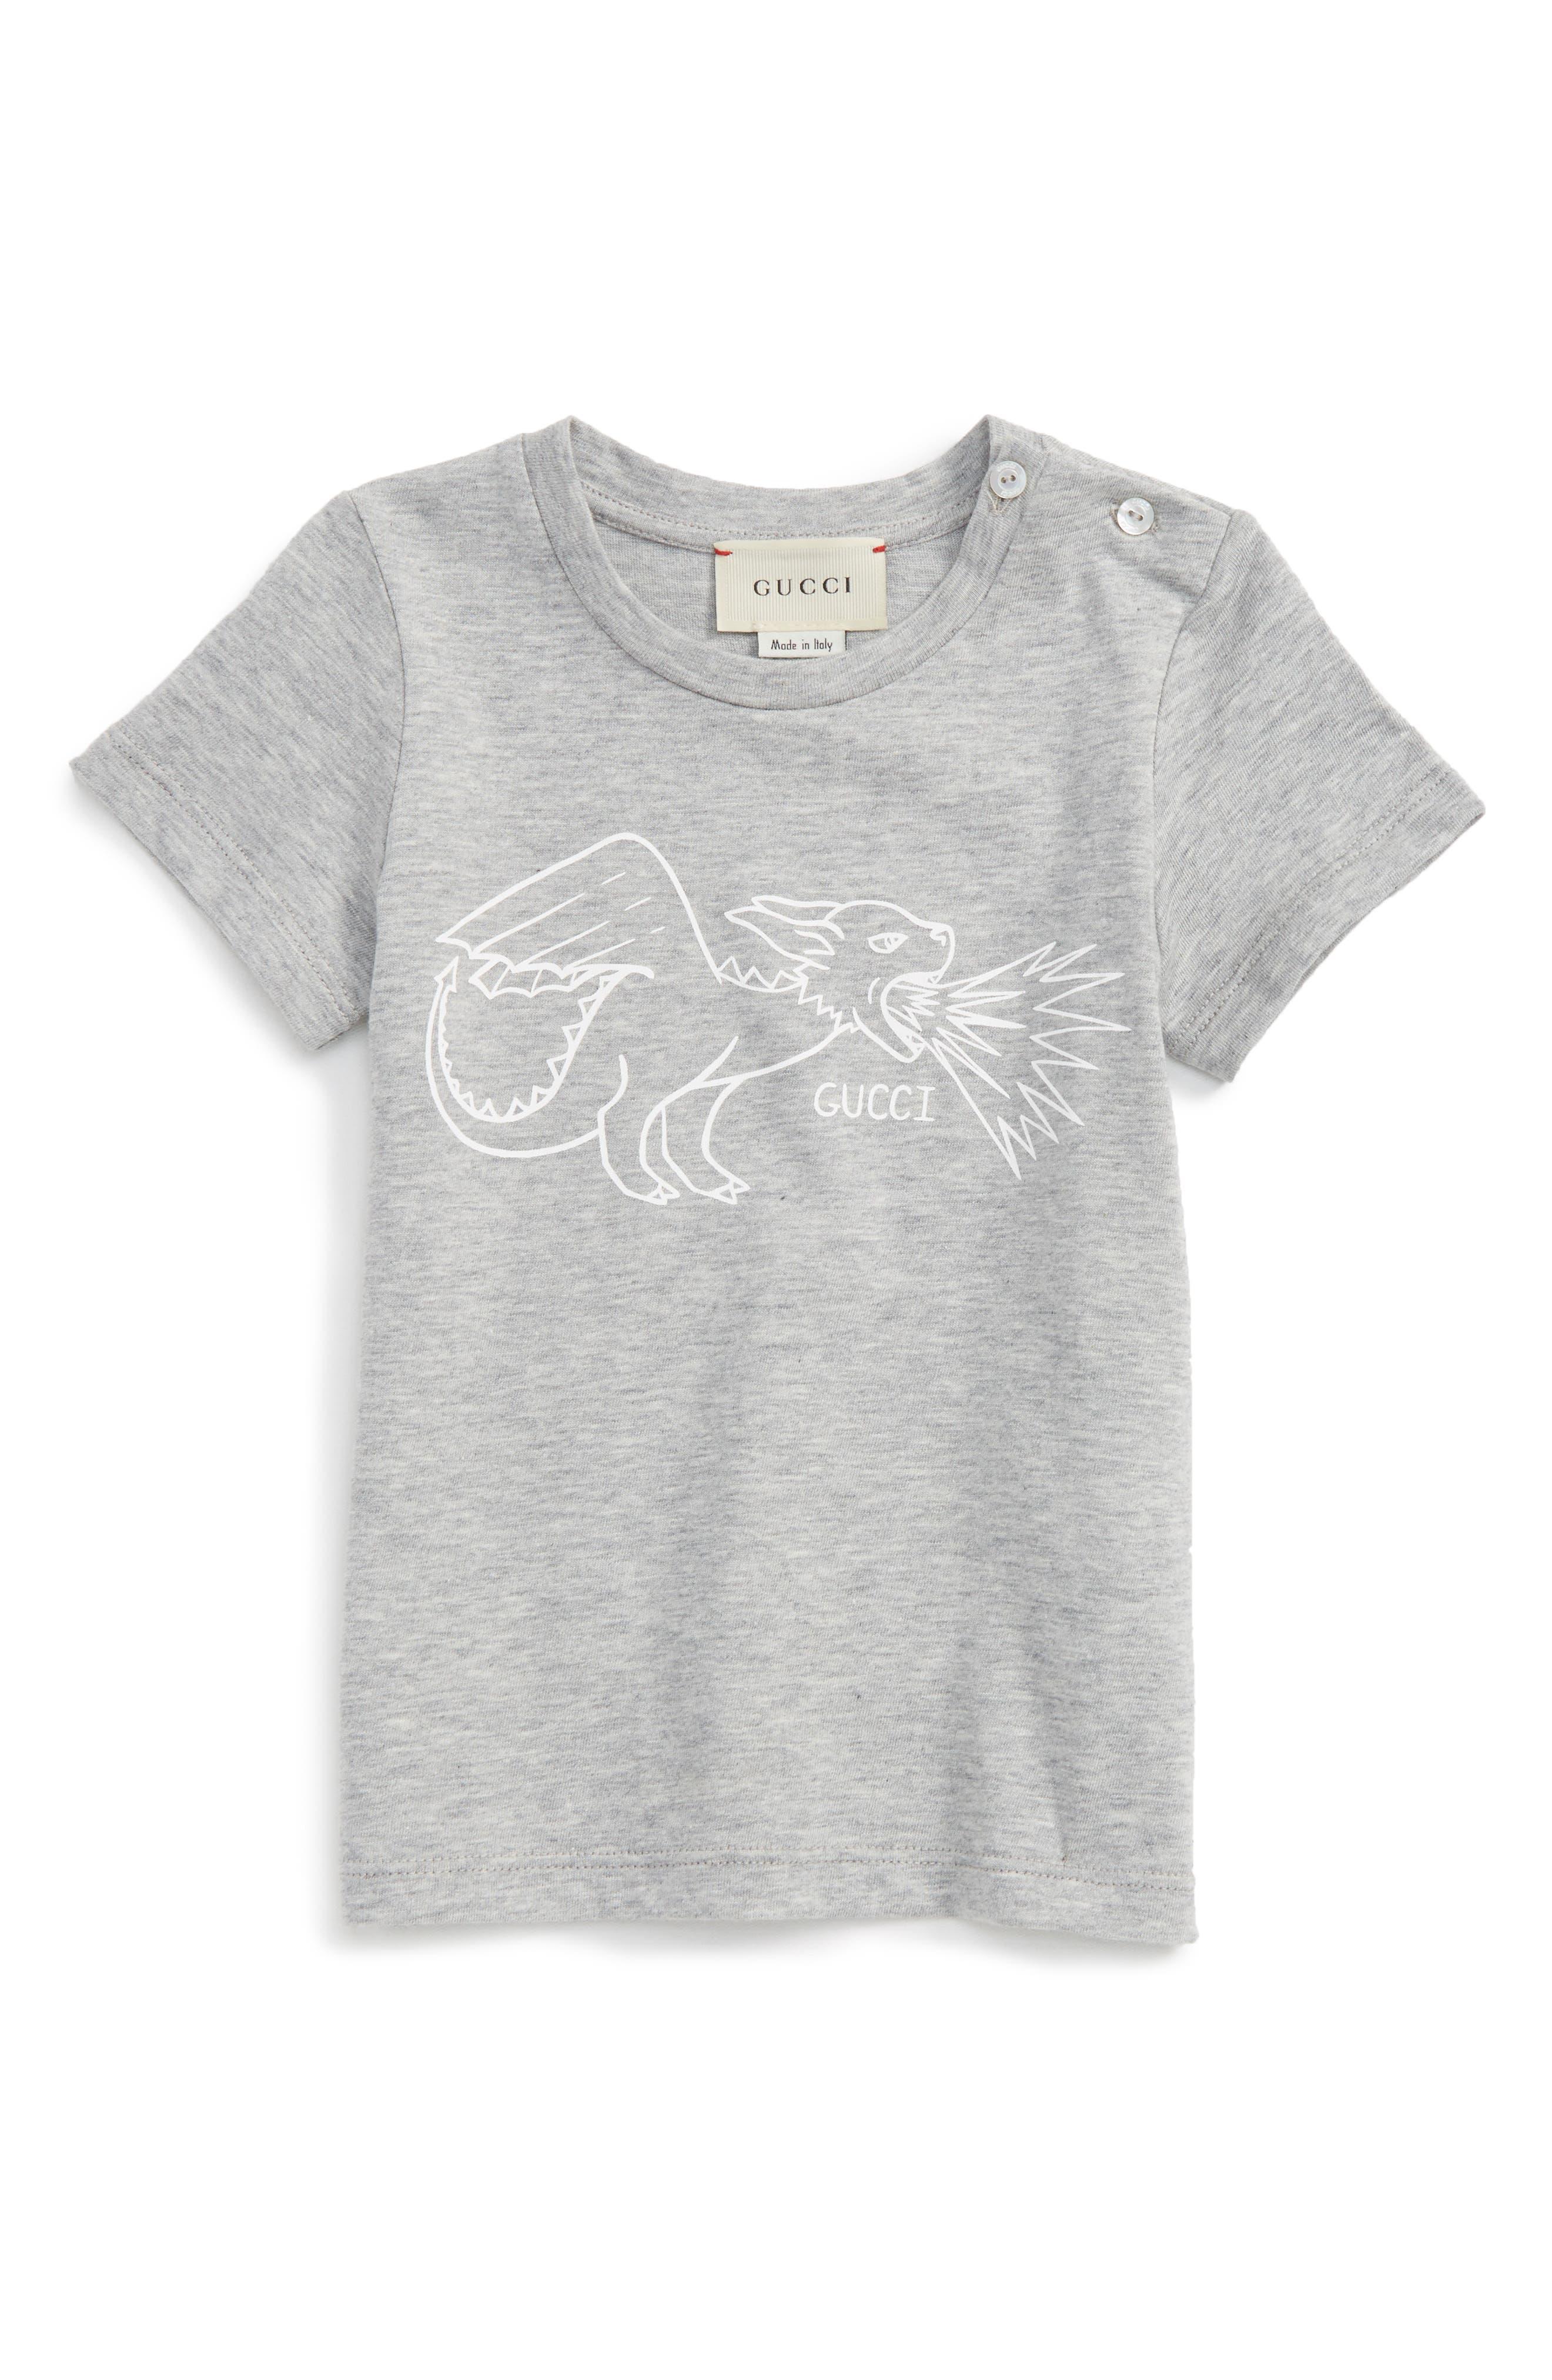 Gucci Dragon Graphic T-Shirt (Baby)